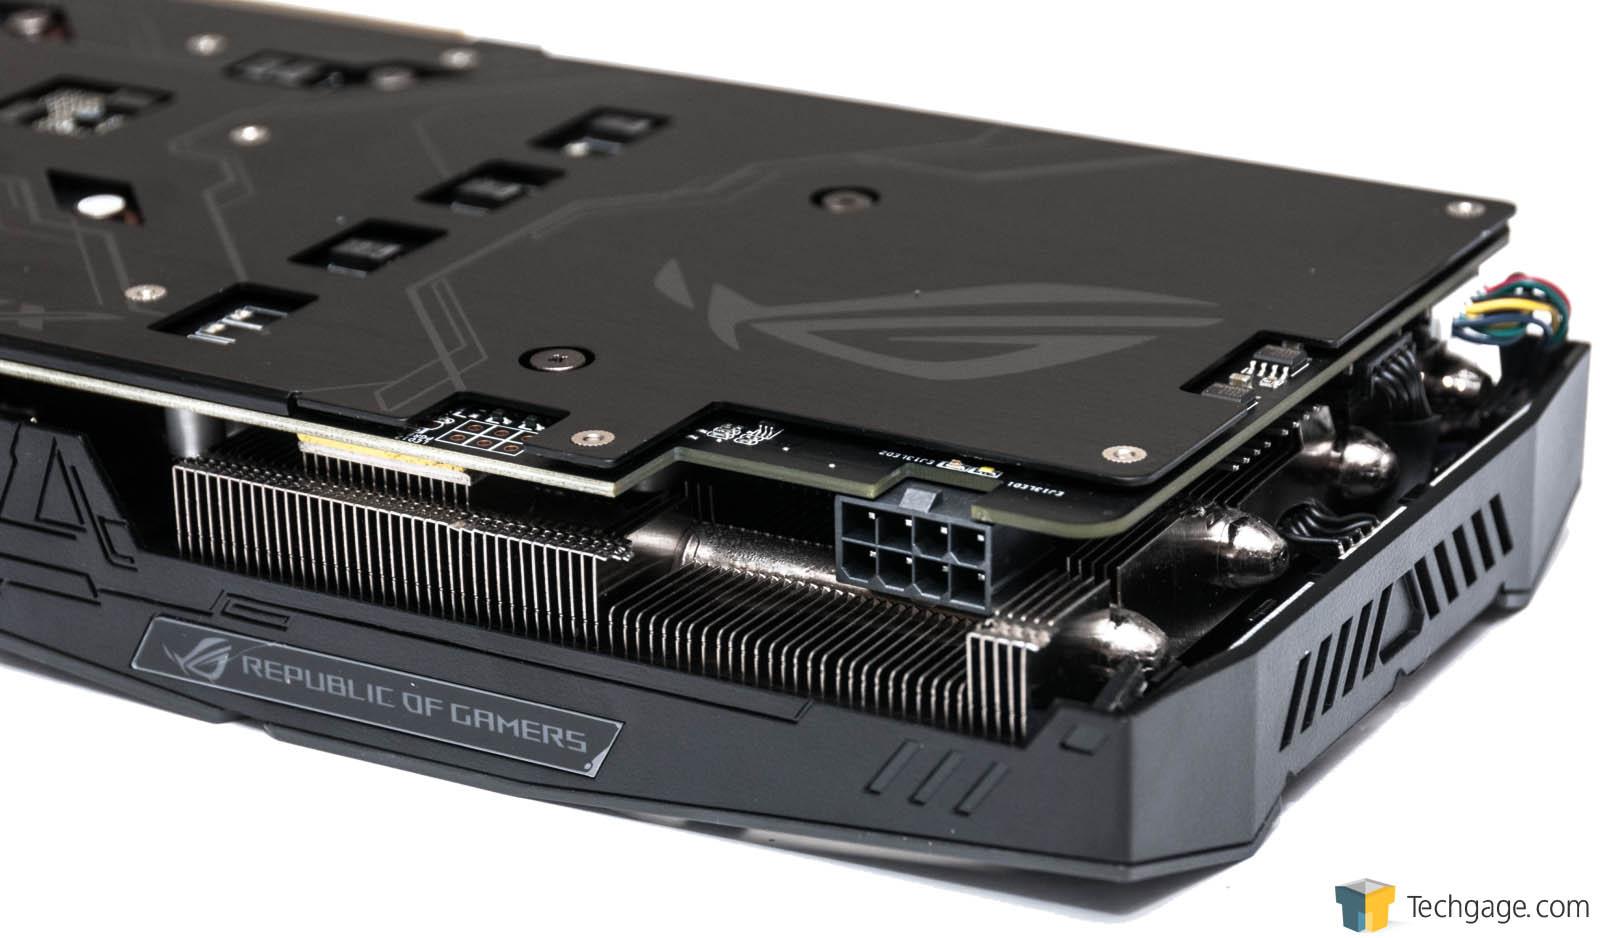 ASUS GeForce GTX 1060 6GB Strix Graphics Card Review – Techgage